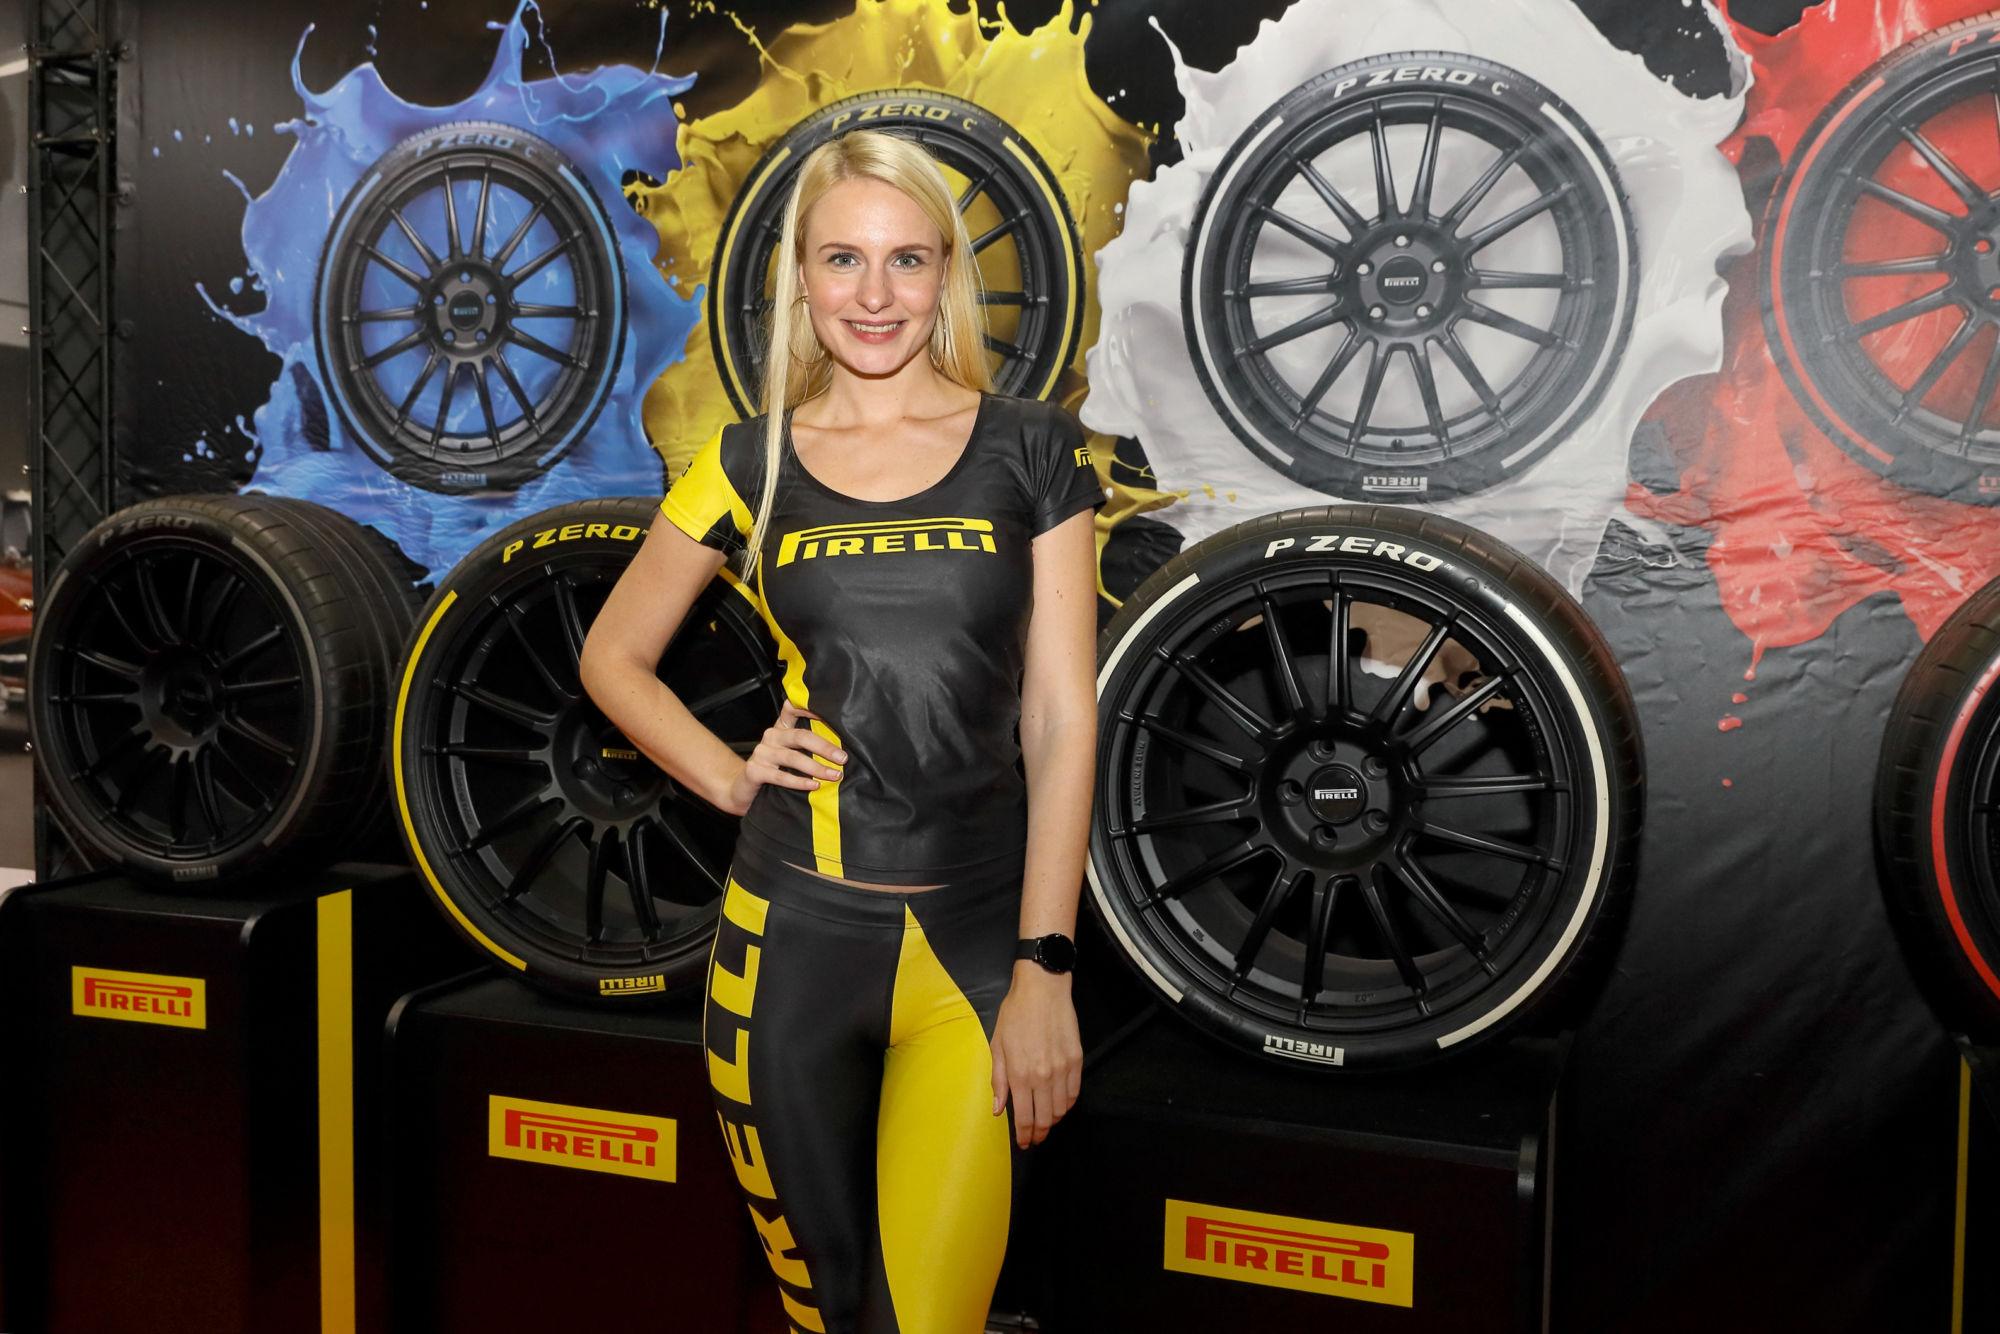 Racing Expo aGlasurit Classic Expo 2019